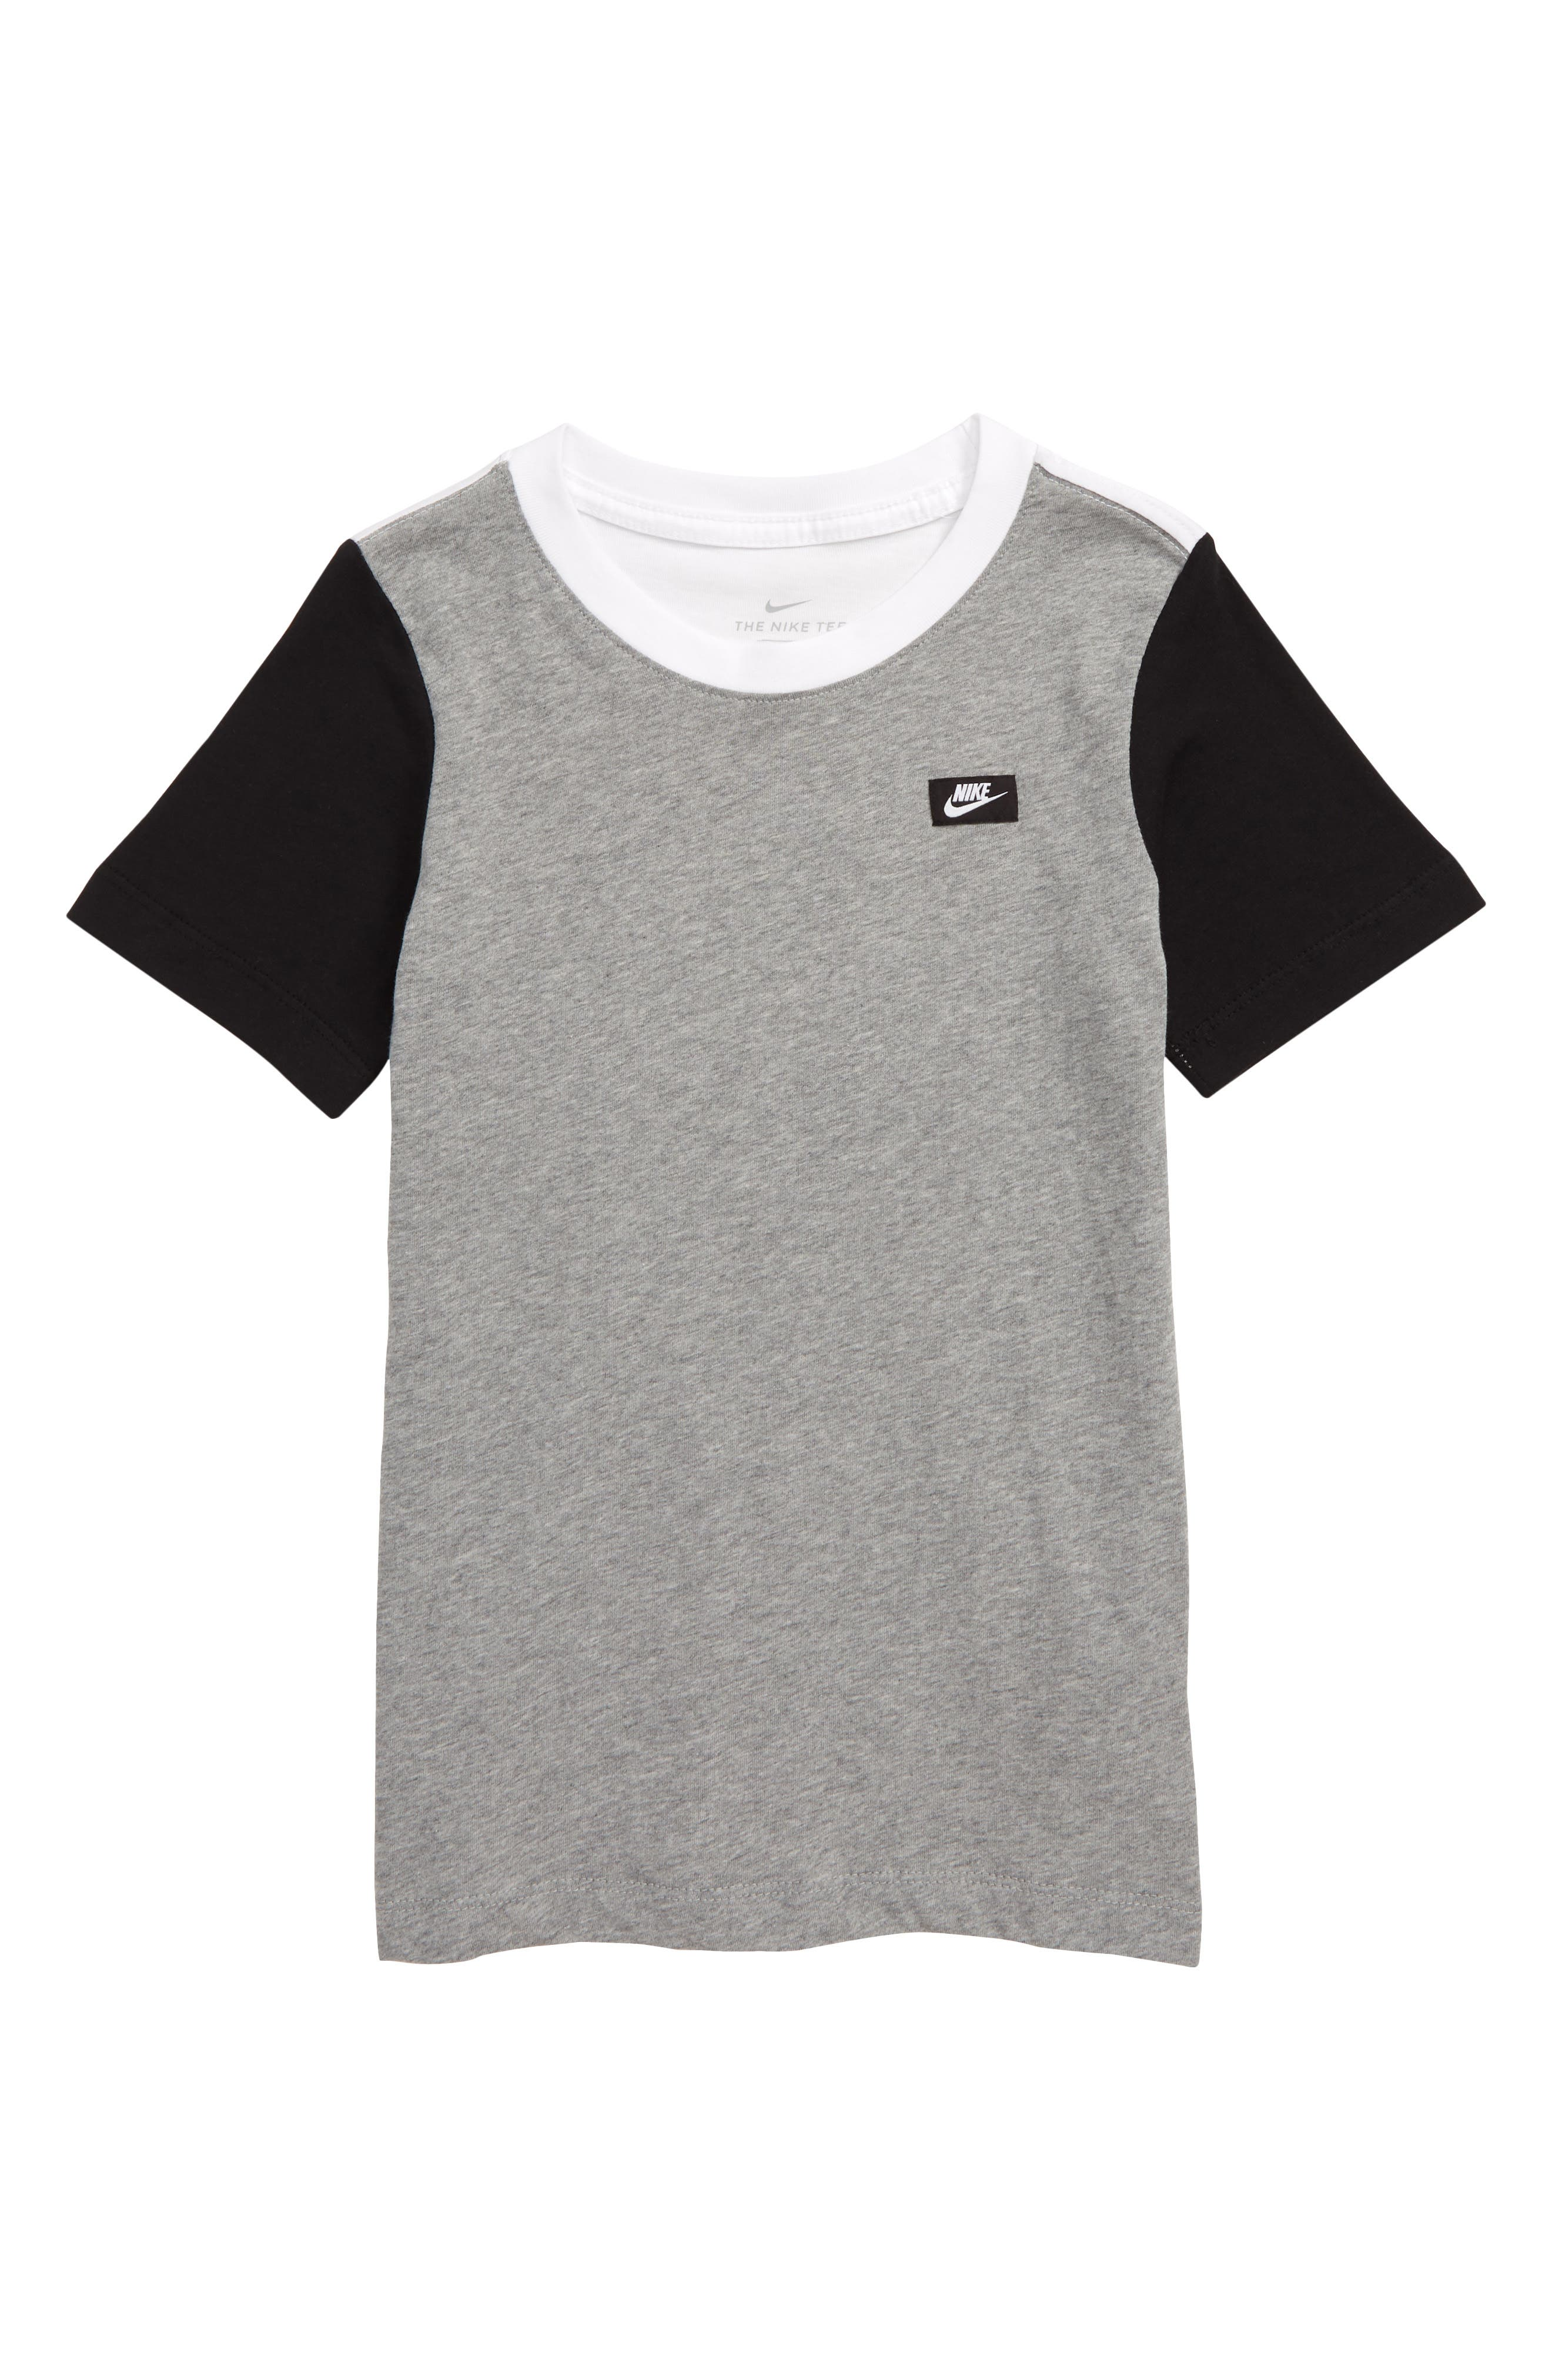 d452e57a36e2f Boys  Nike T-Shirts (2T-7)  Henley